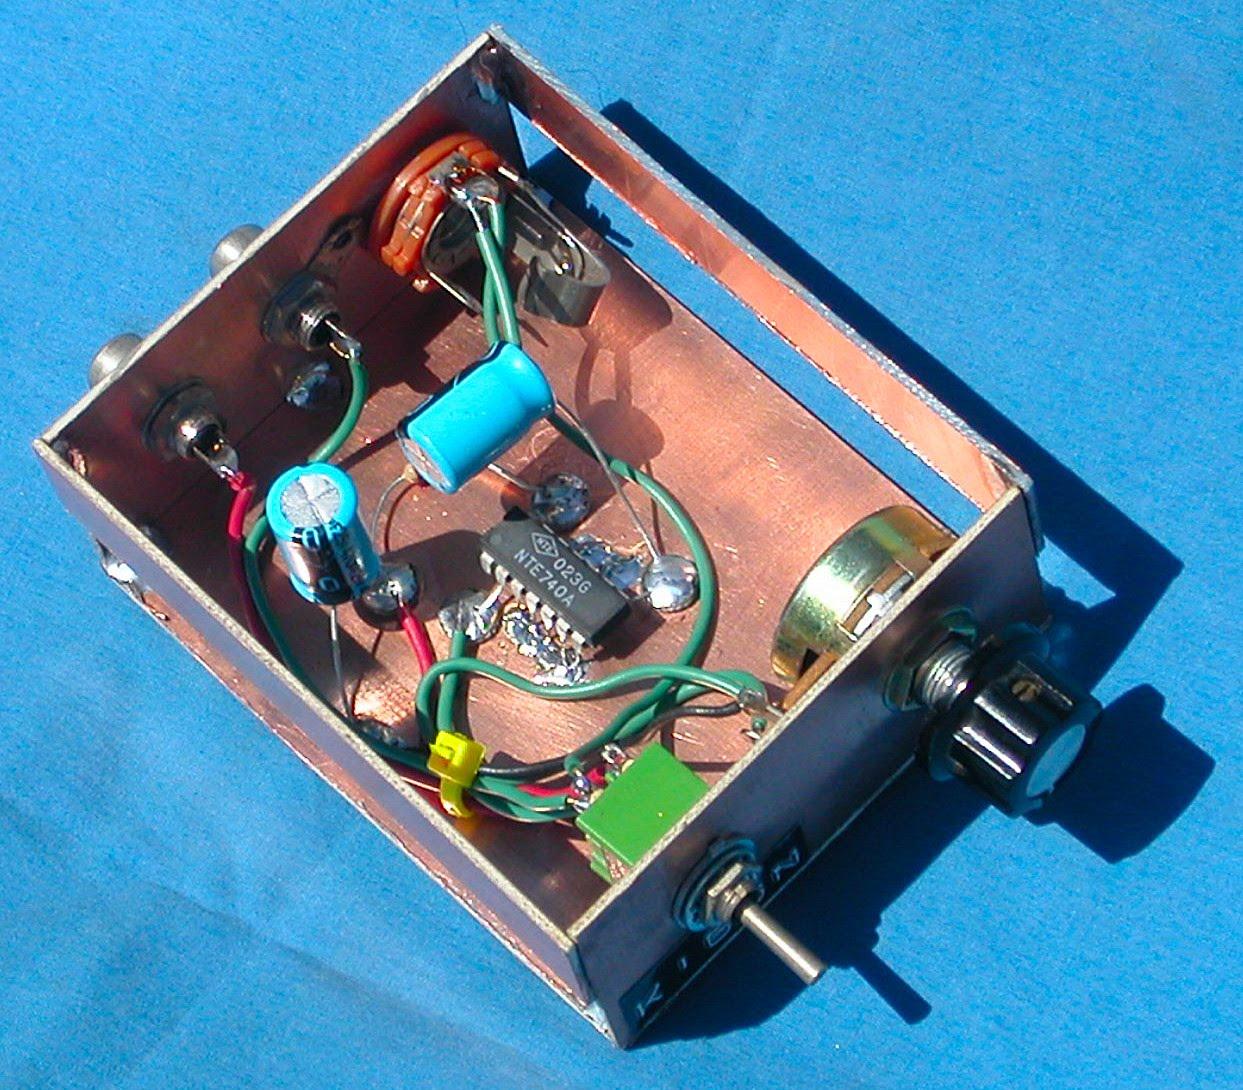 Lm380 Audio Amplifier 25 Watt Trail Friendly Radio Extra Ki For The Field 1243x1090